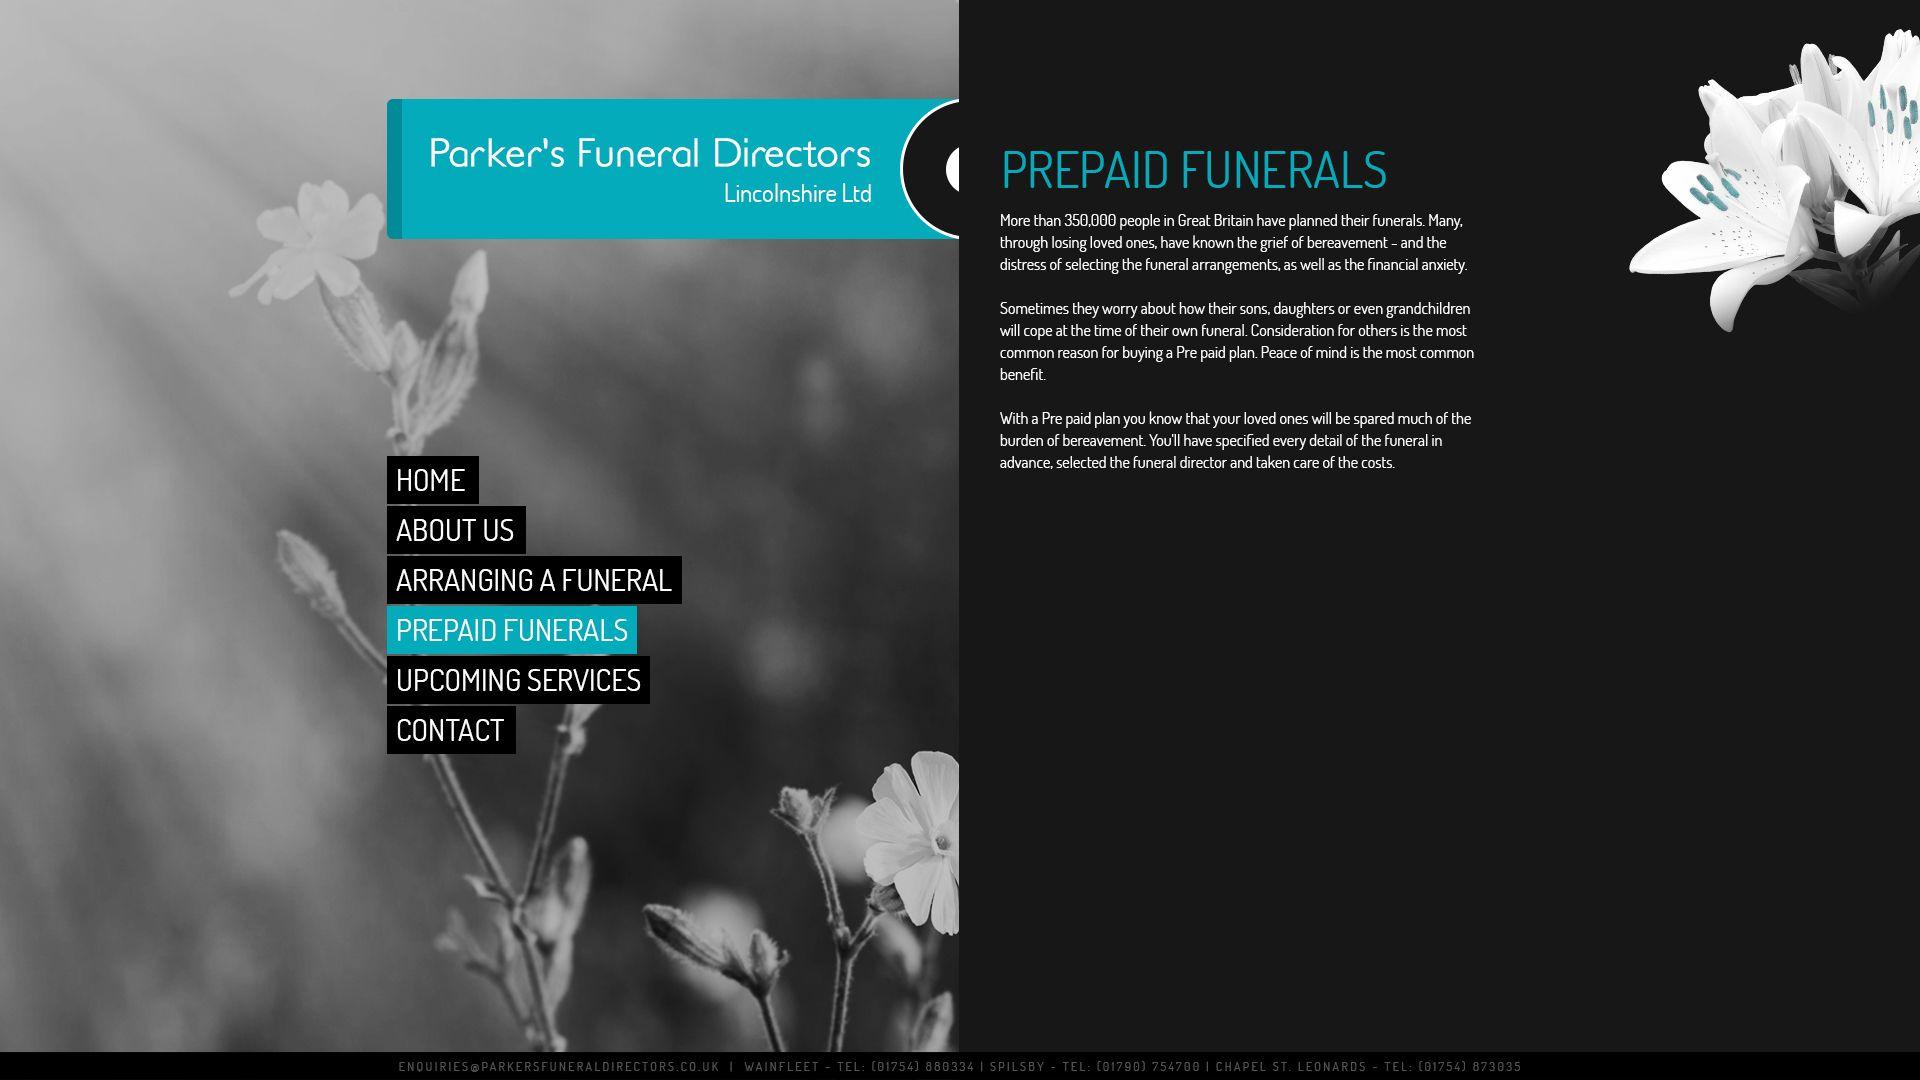 7 best parker s funeral directors funeral website images on